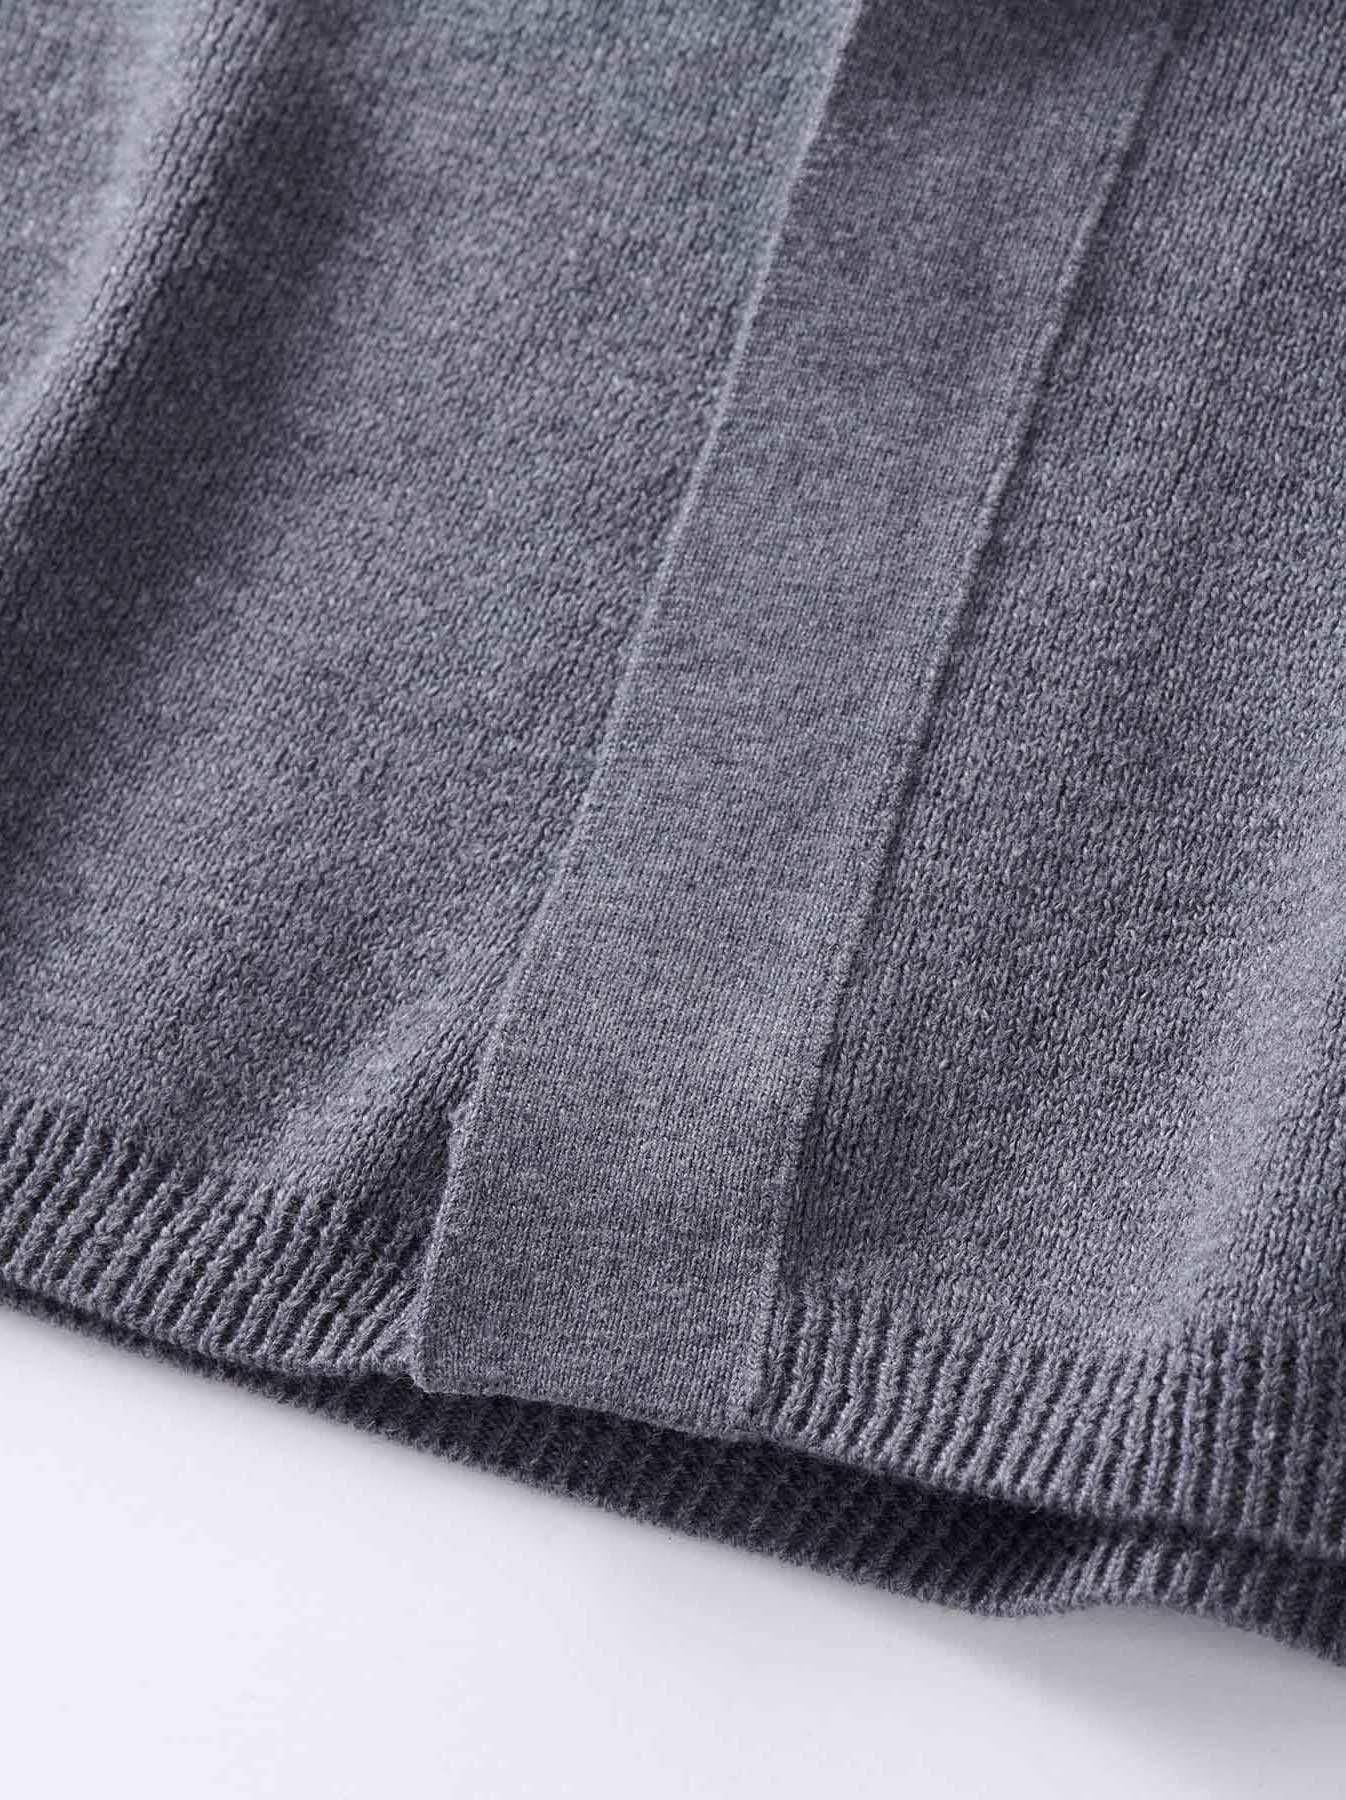 WH Supima Knit-sew Coat-11